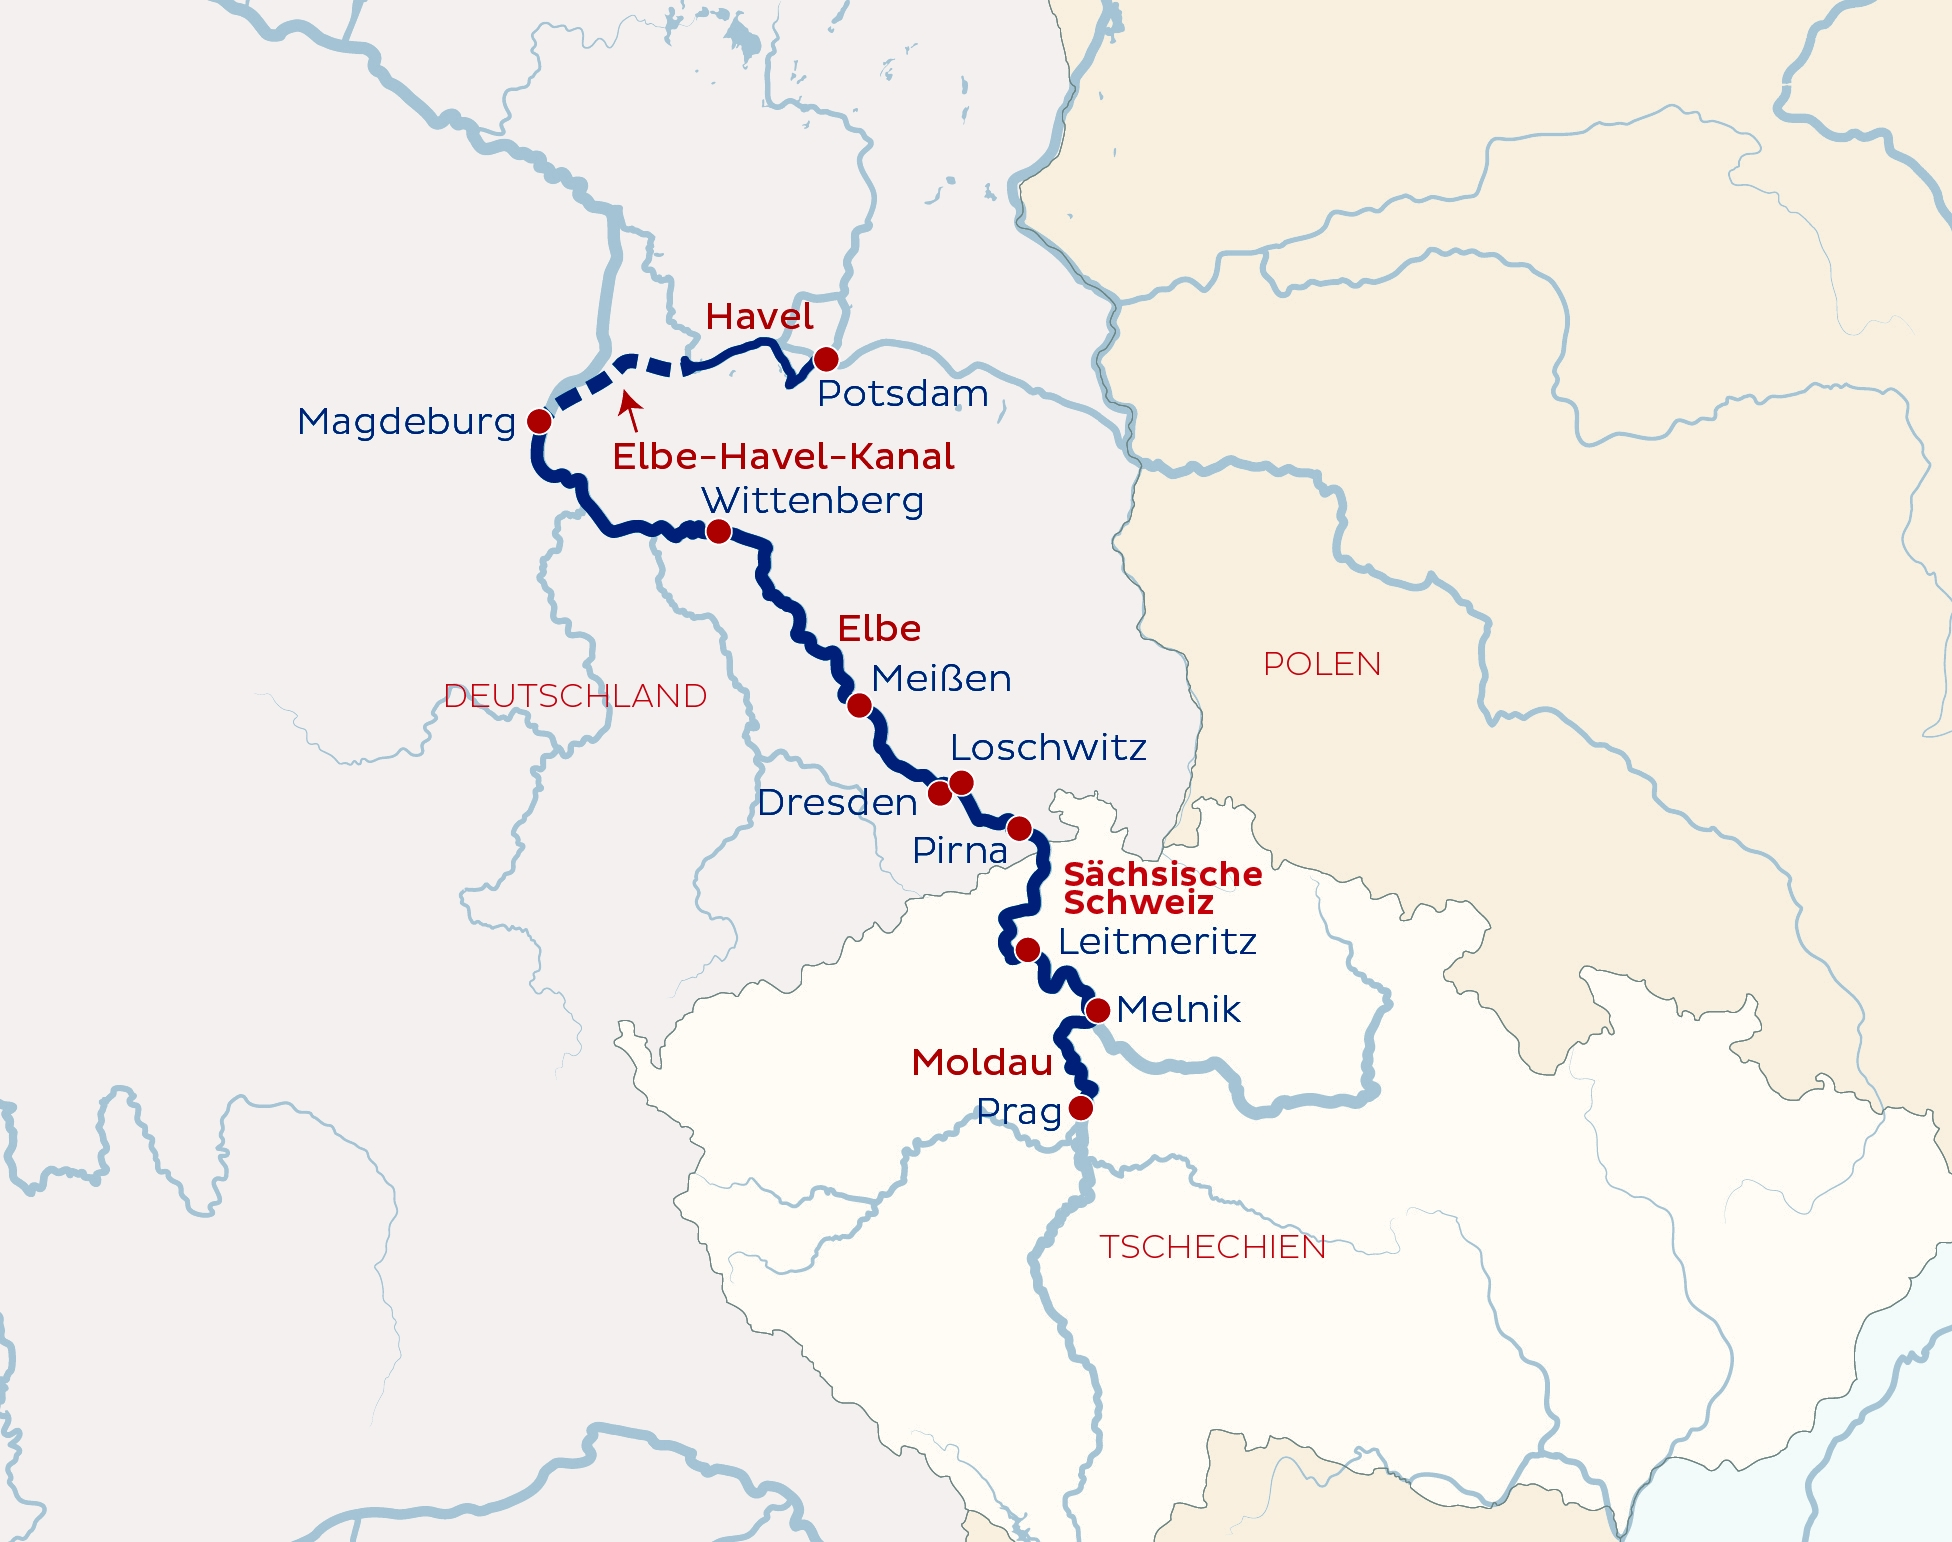 Prag Karte Europa.Rtd Reisen Reiseziele Europa Deutschland